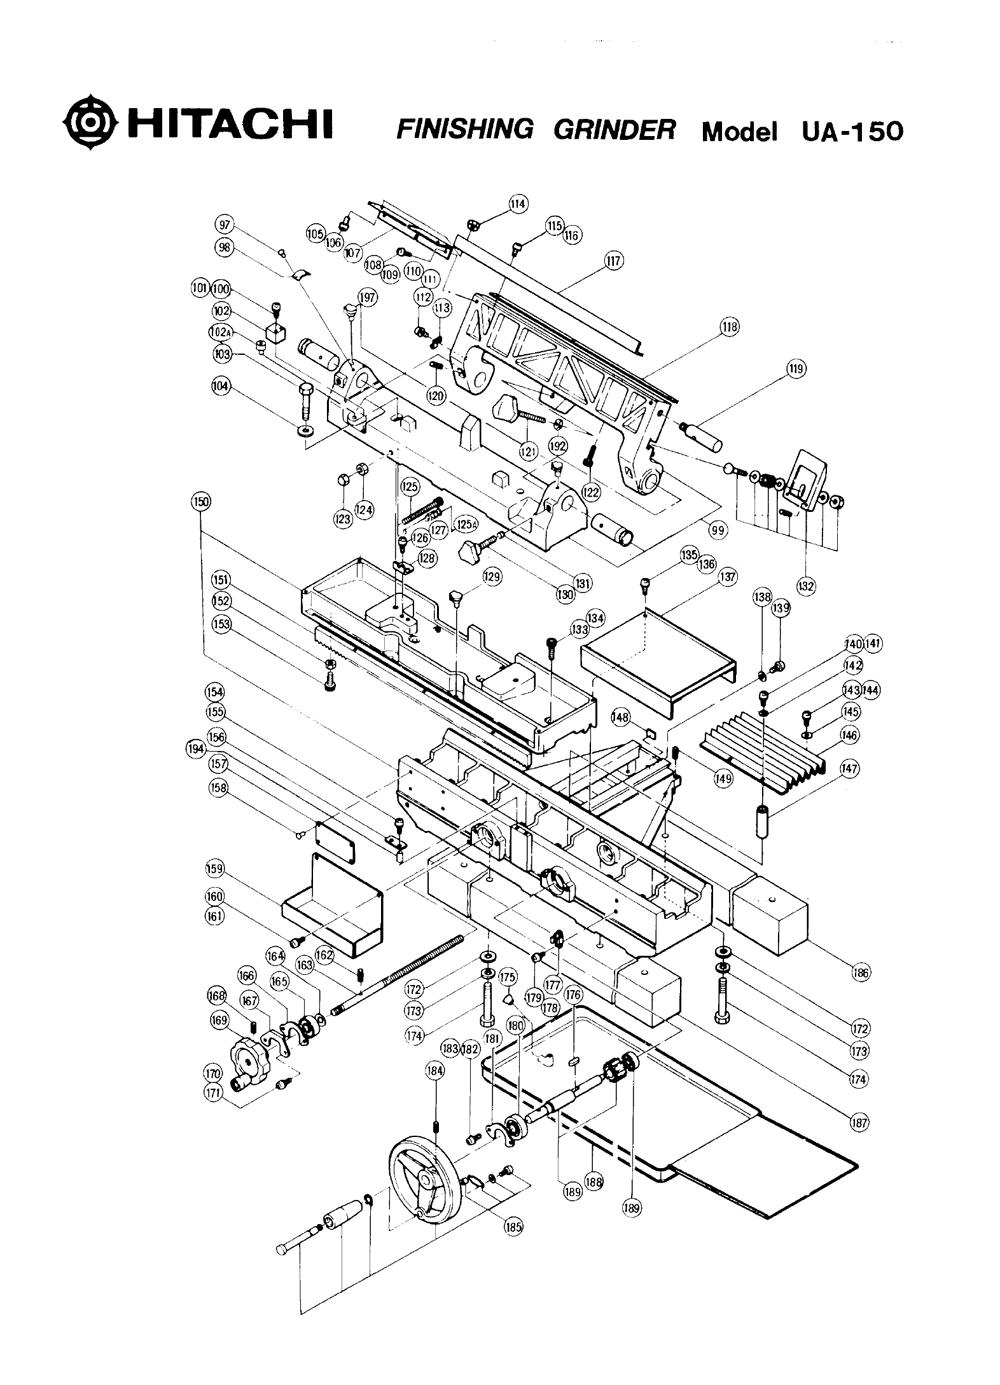 UA-150-Hitachi-PB-1Break Down